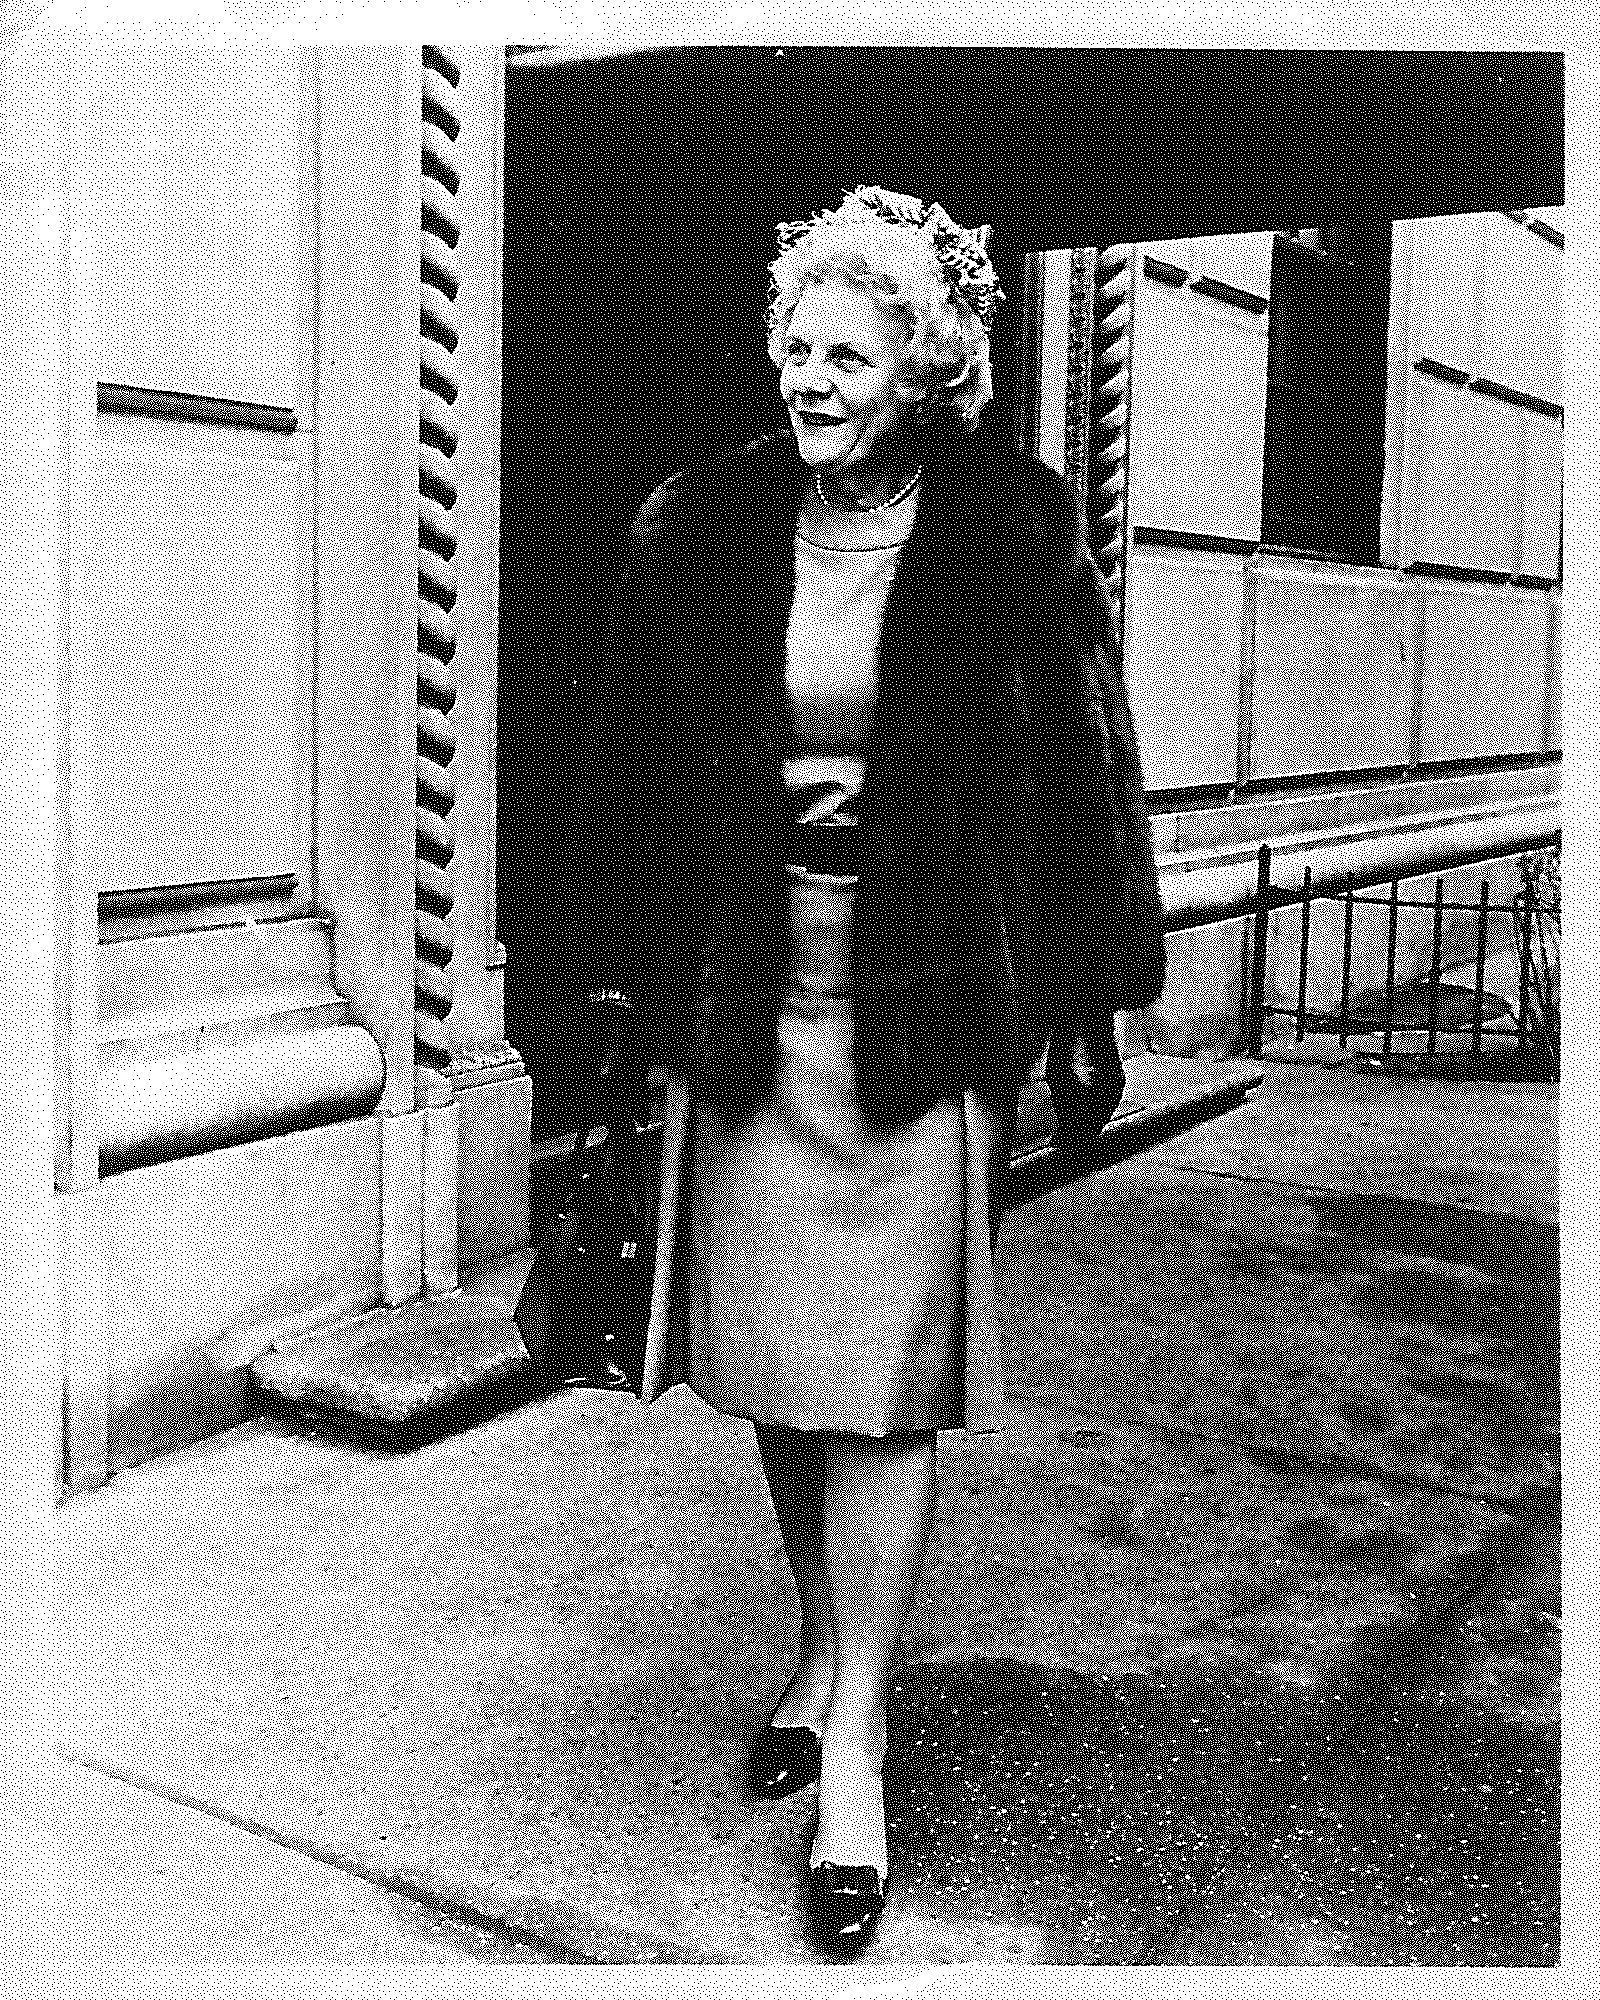 Ruth_Stafford_Peale_New_York